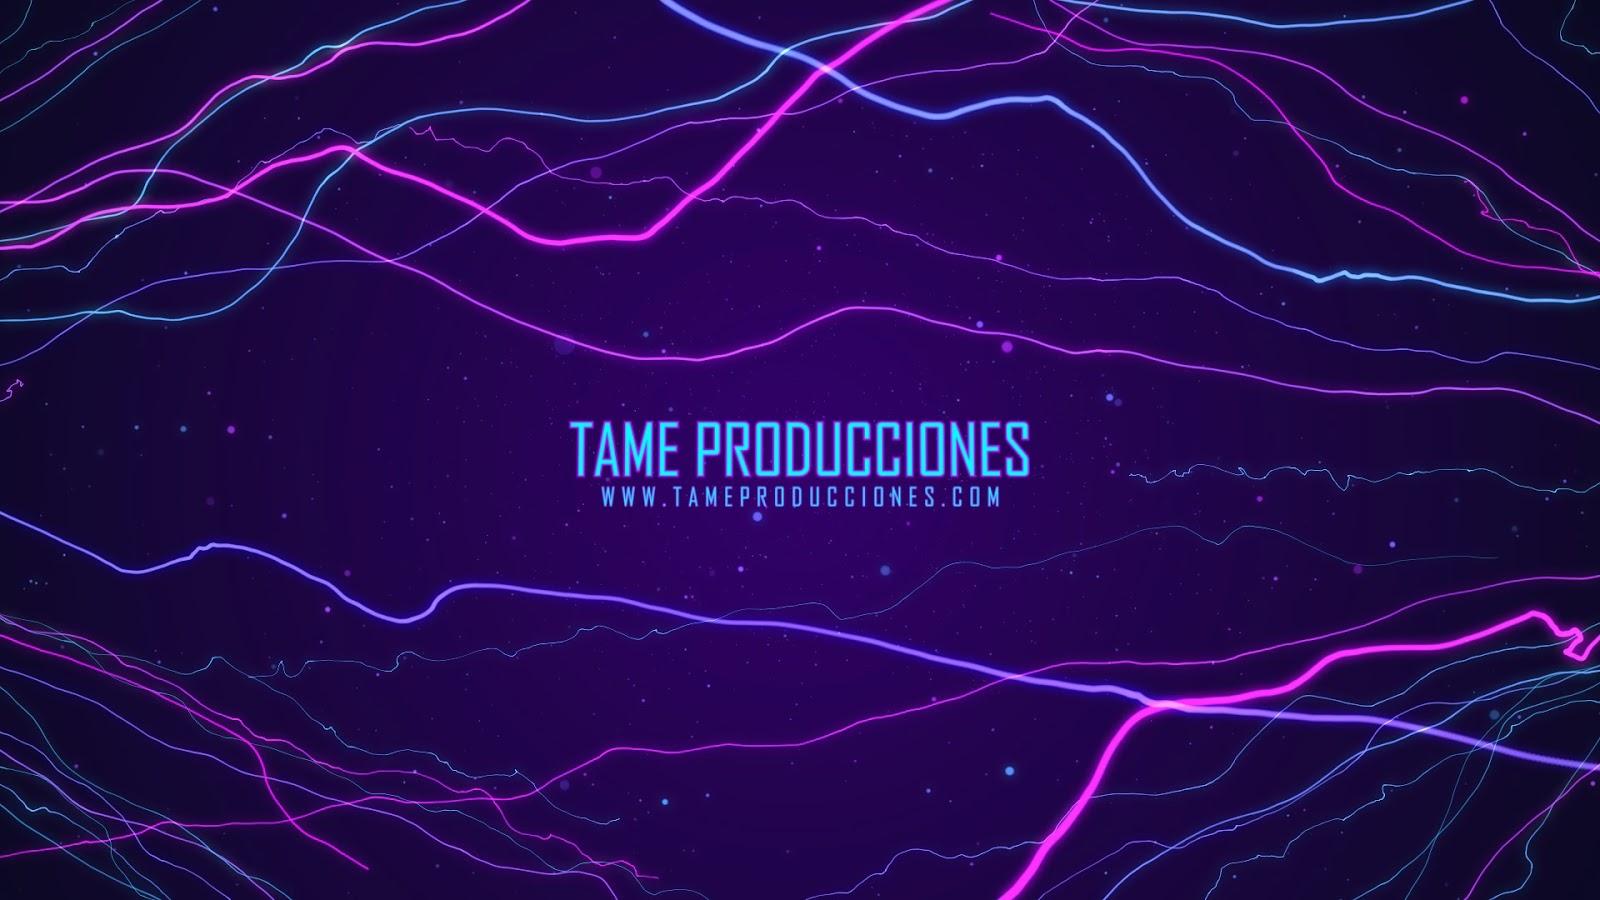 Tame Producciones Free Template Sony Vegas Pro 11 12 13 Color